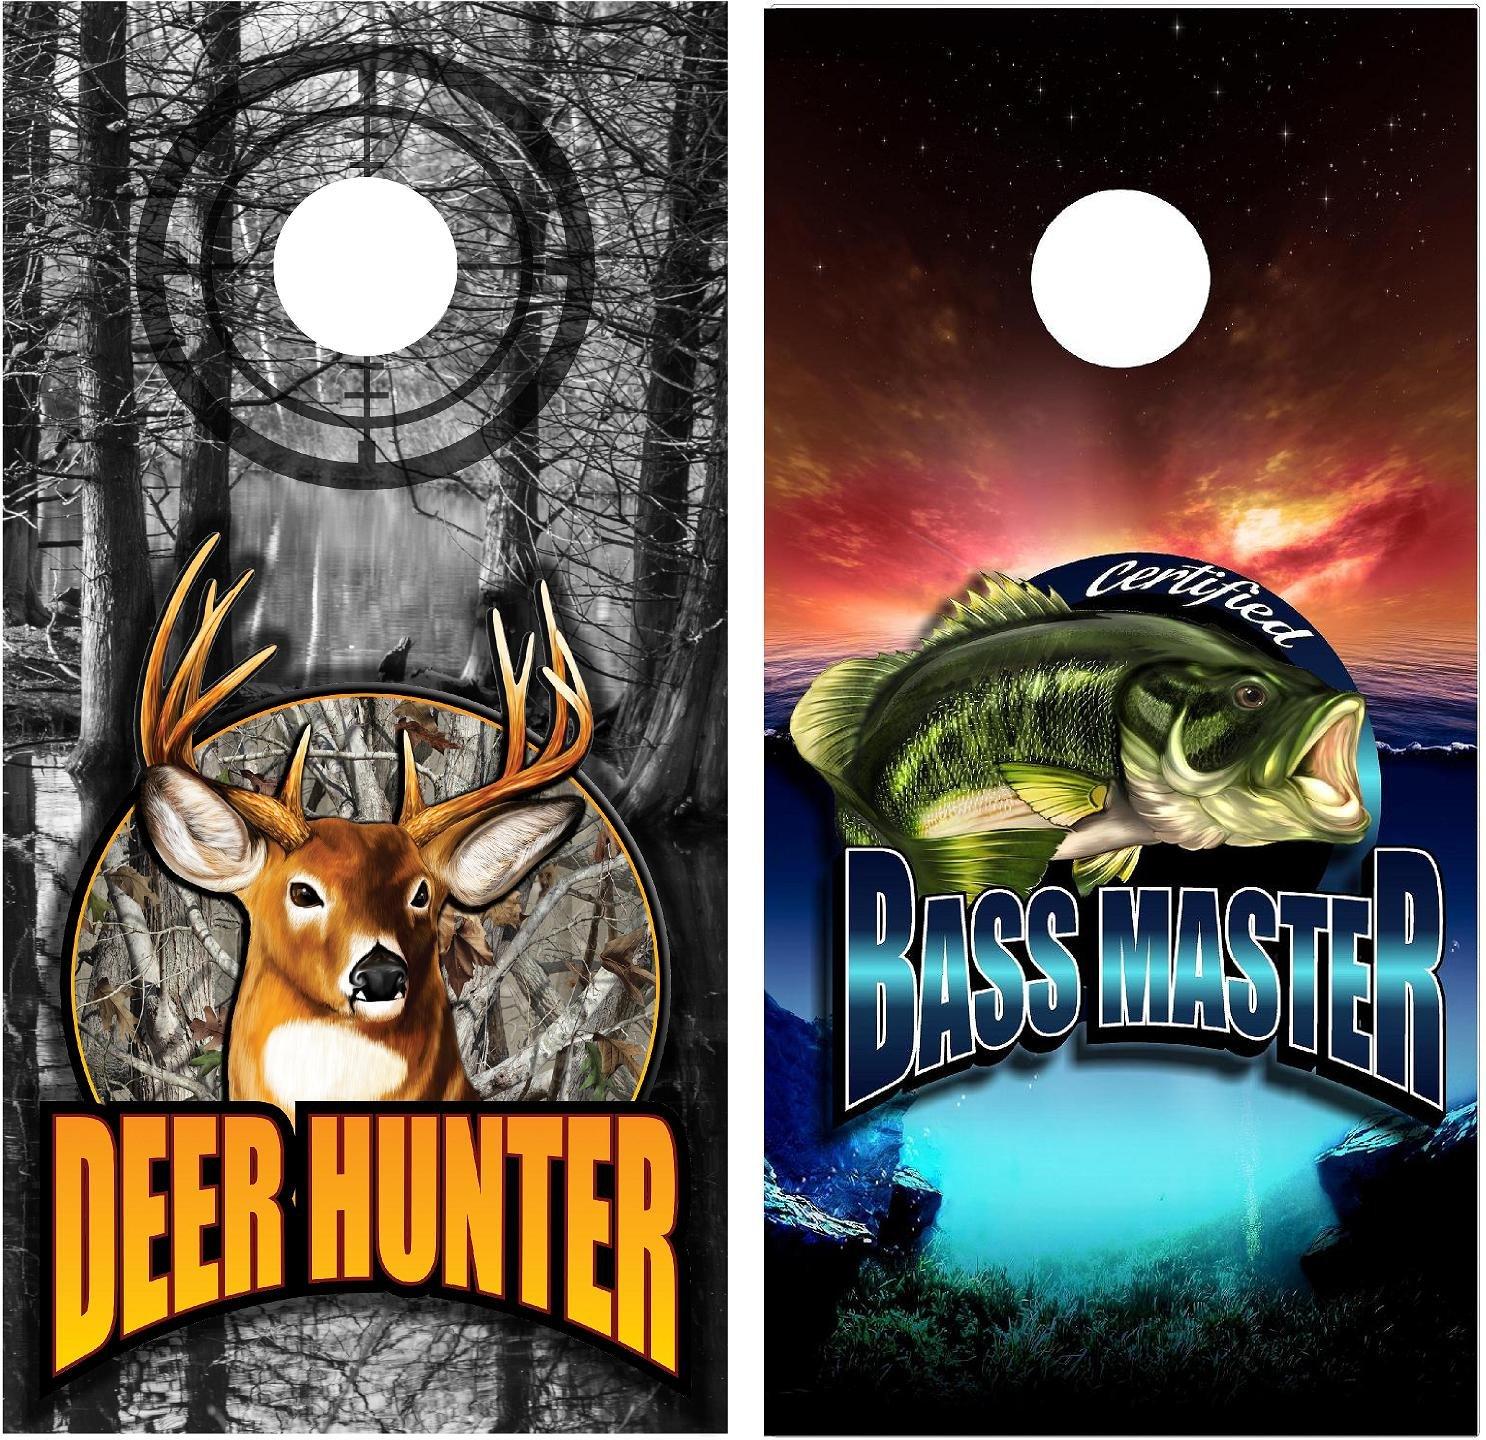 Corn Hole Wrap set! Deer Hunter vs Bass Master 2x Decals (24'' x 48'') Custom Camo logo Sport White Tail Sunset Lake graphics for cornhole baggo Bag Toss boards game